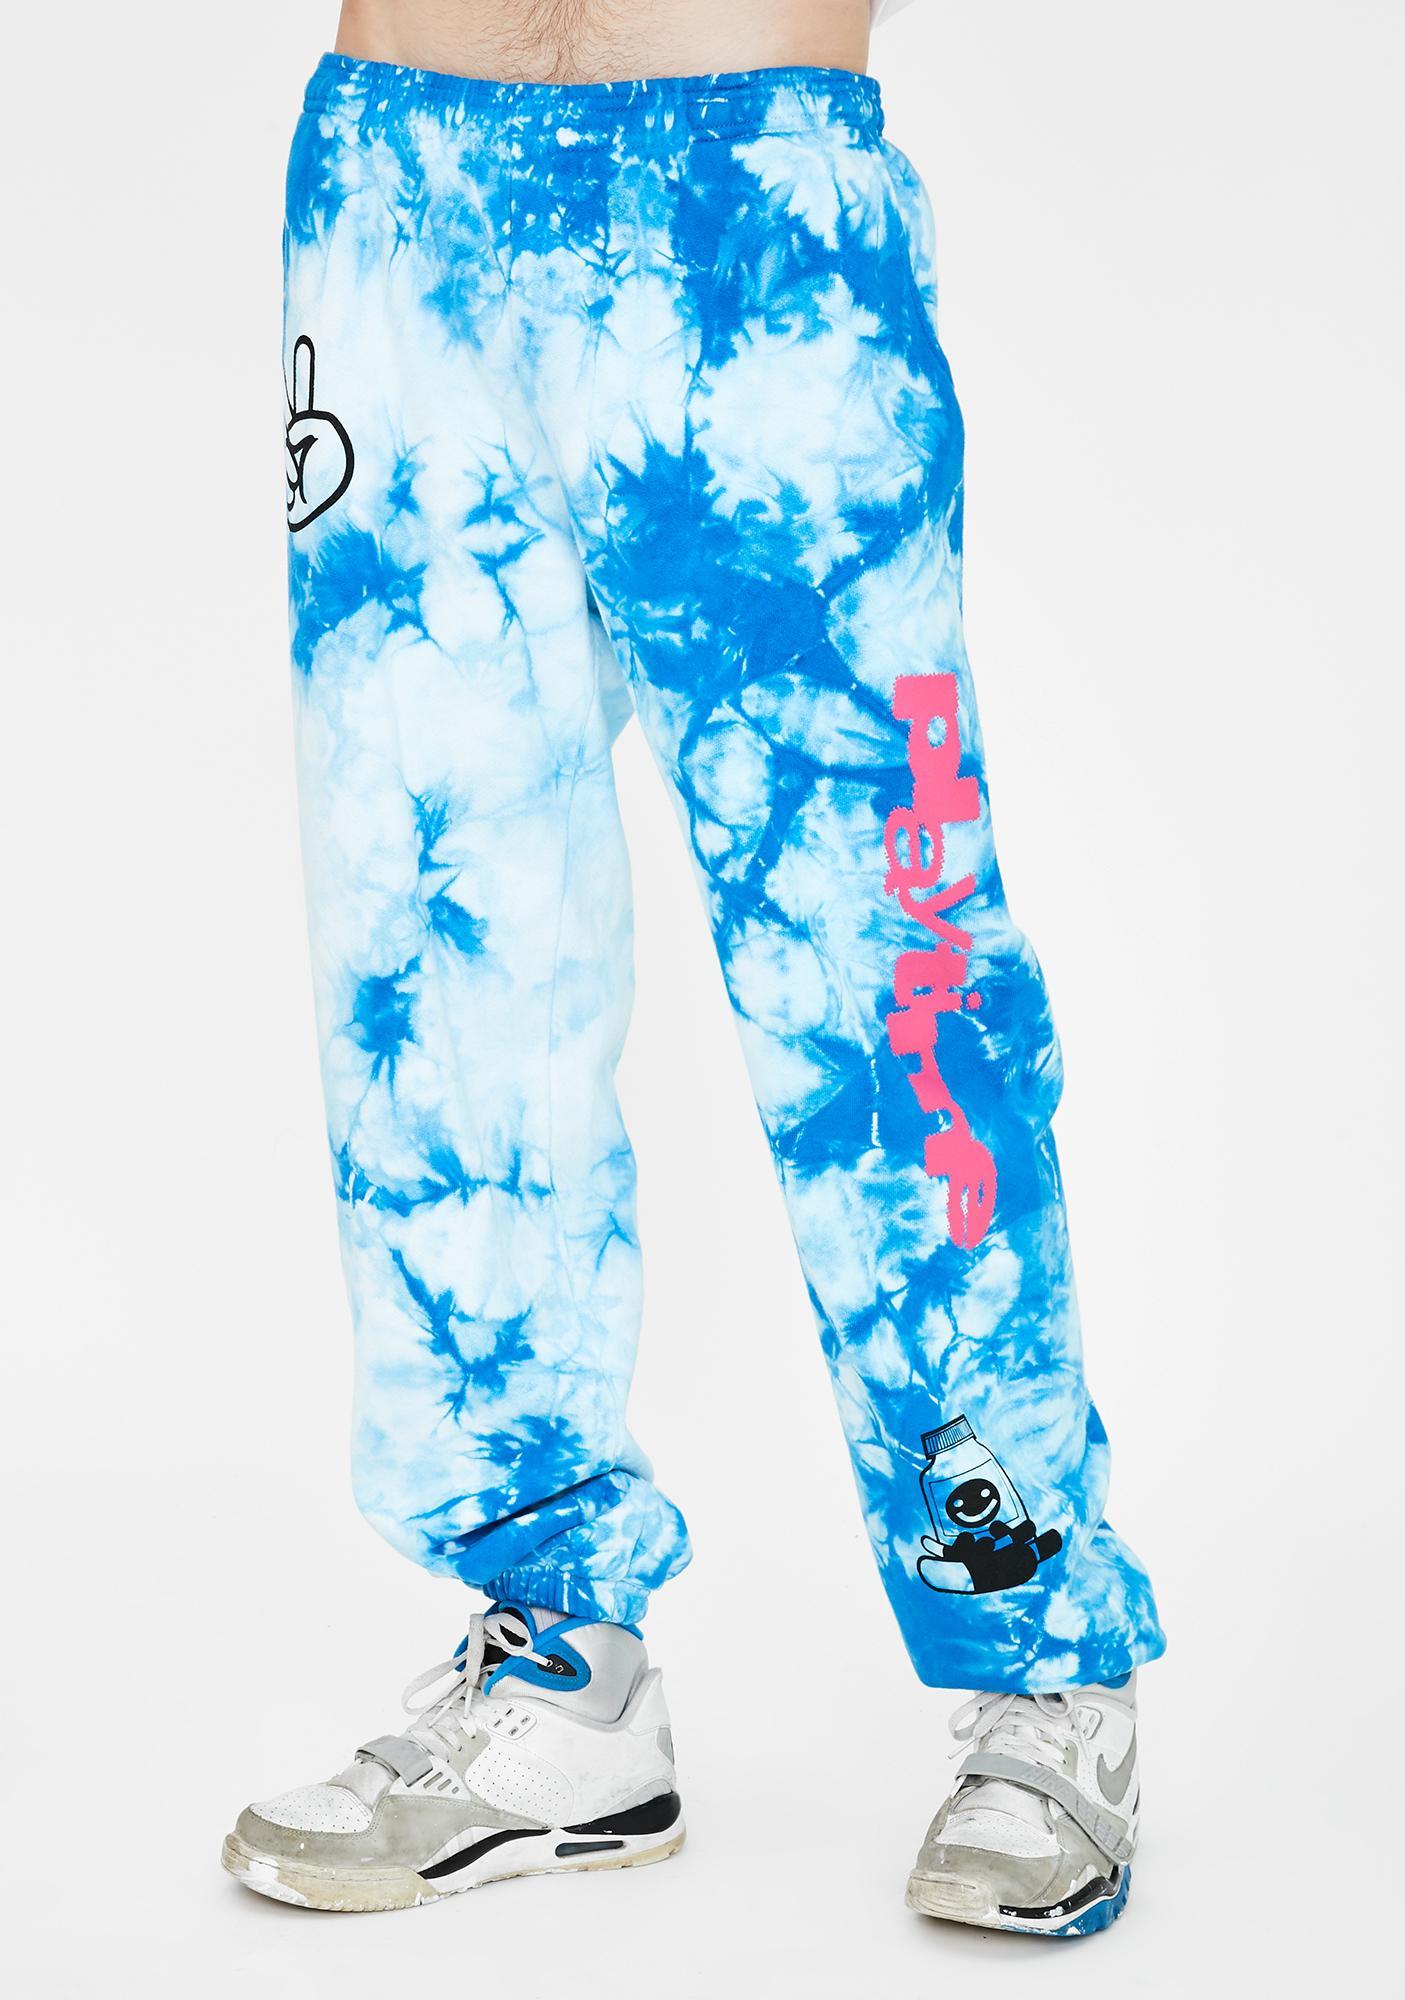 Club Fantasy Playtime Tie Dye Sweatpants